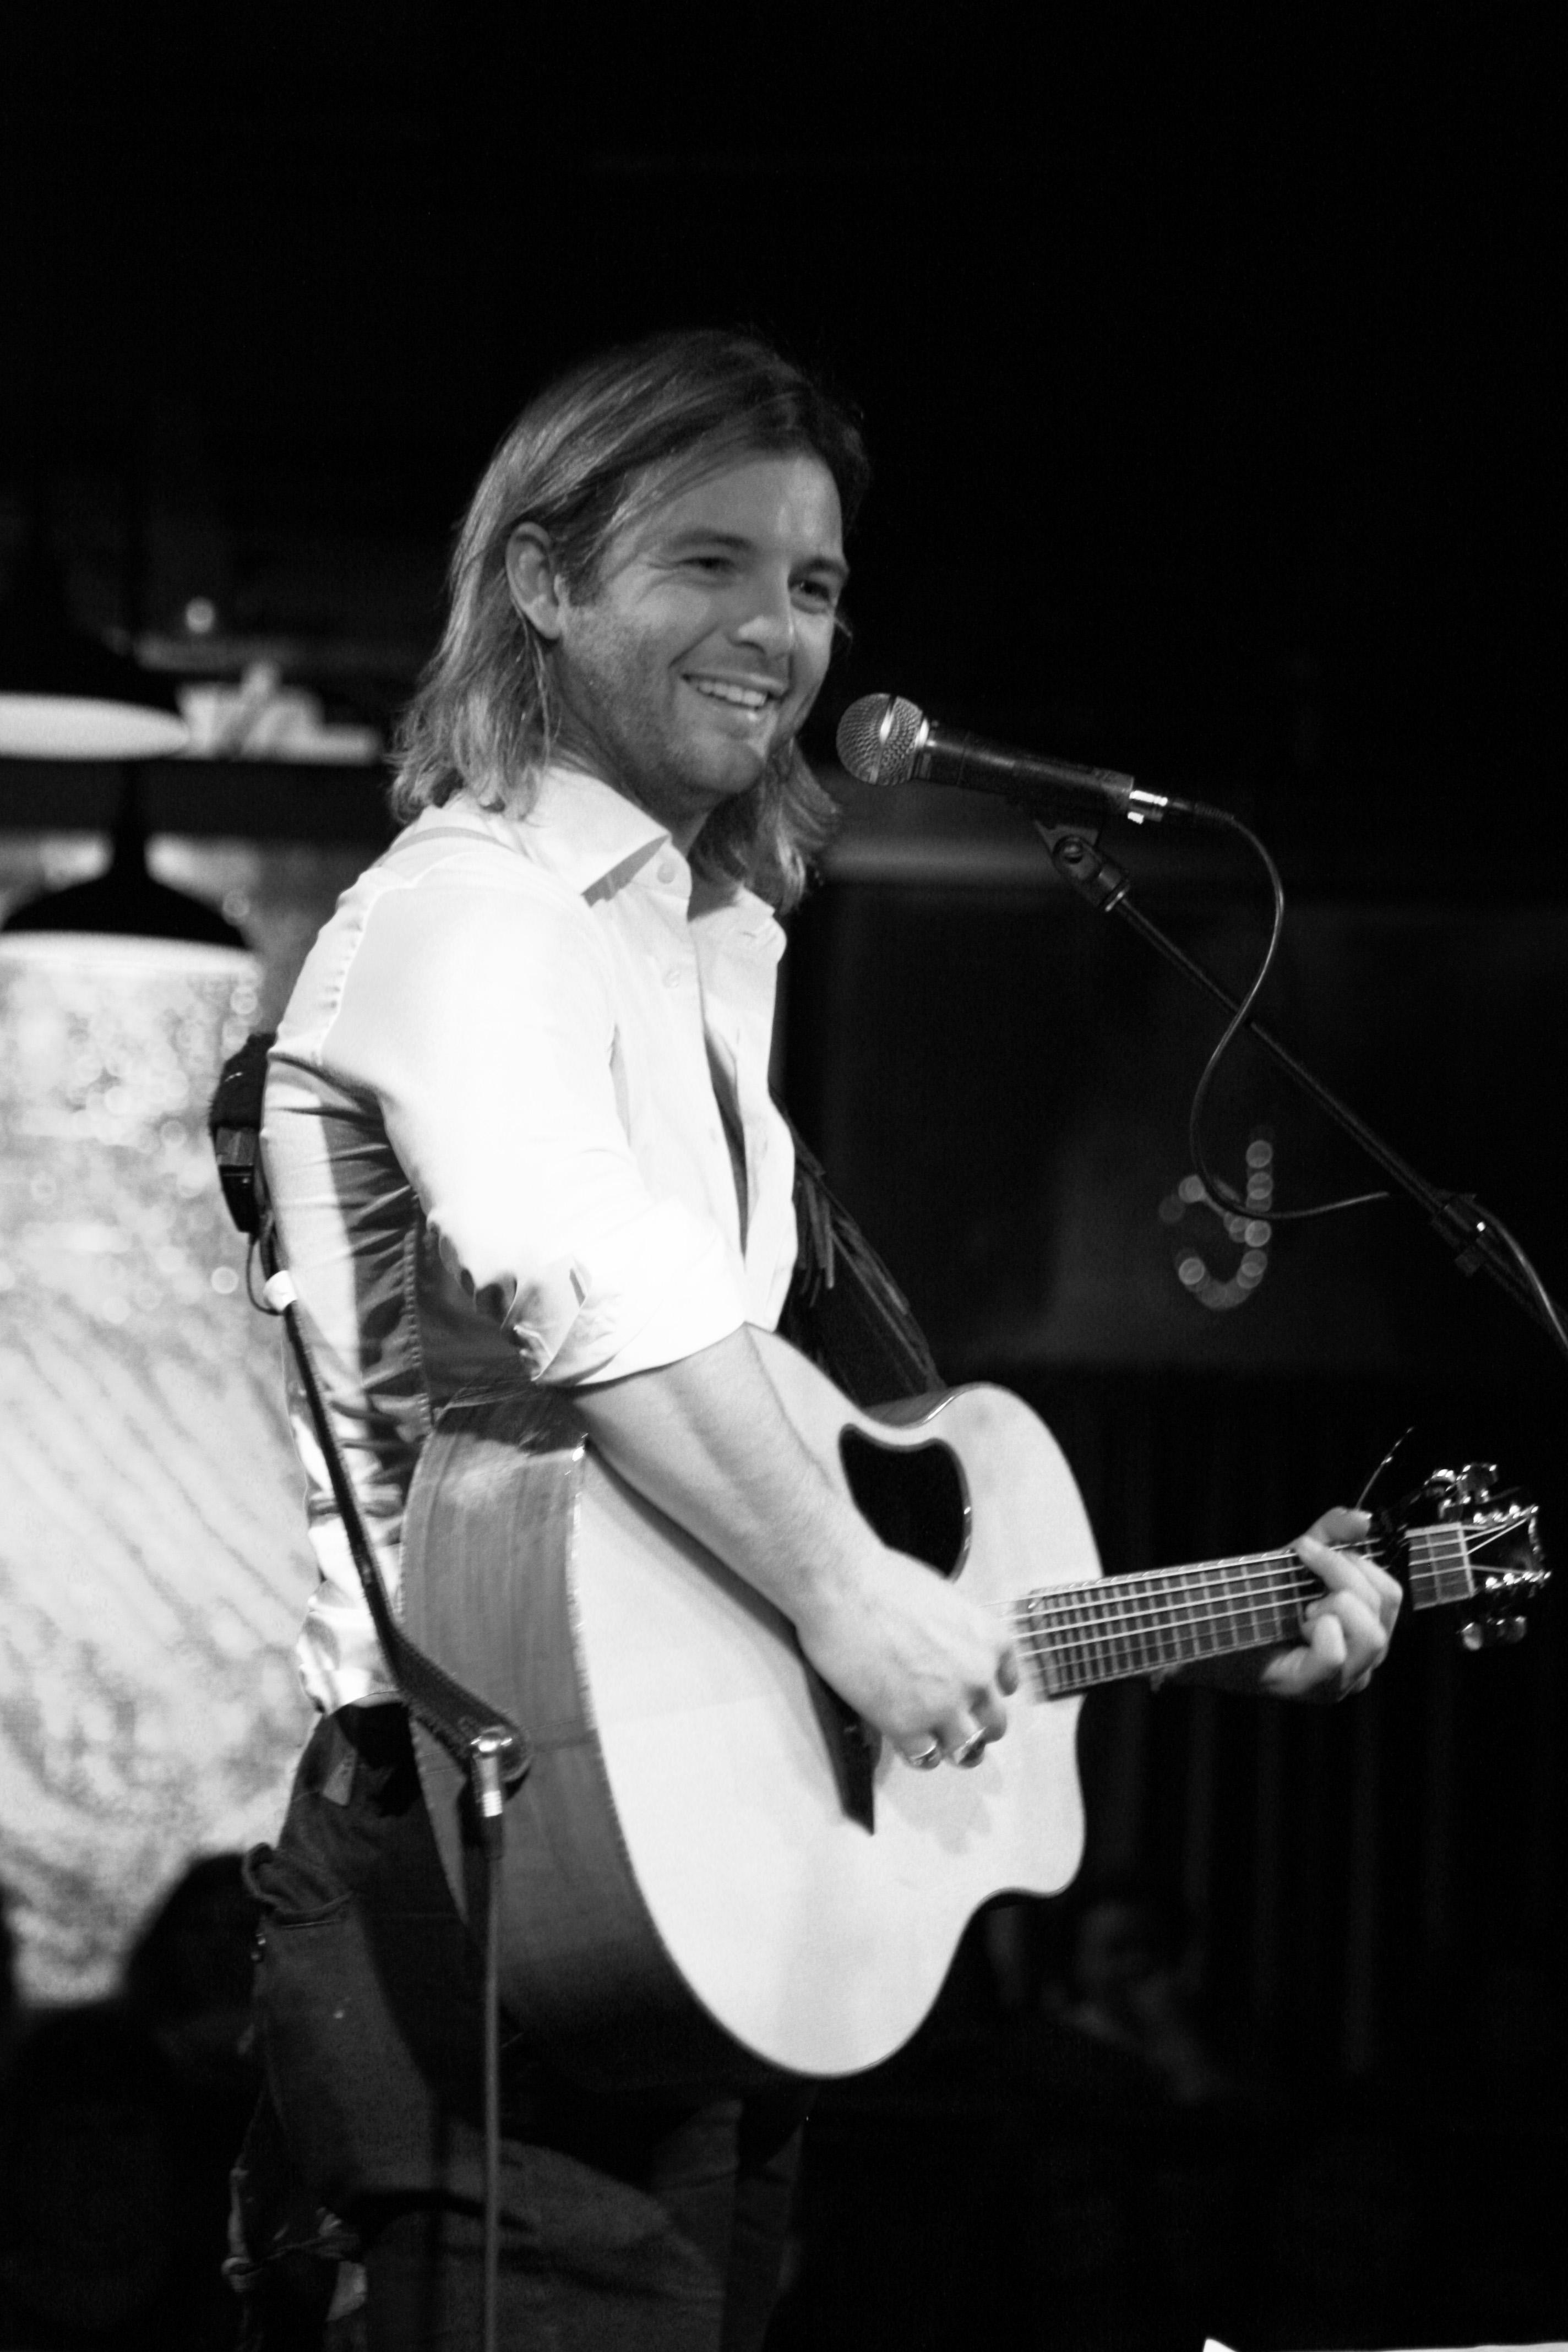 keith harkin gig | Sarah Forshaw's Blog